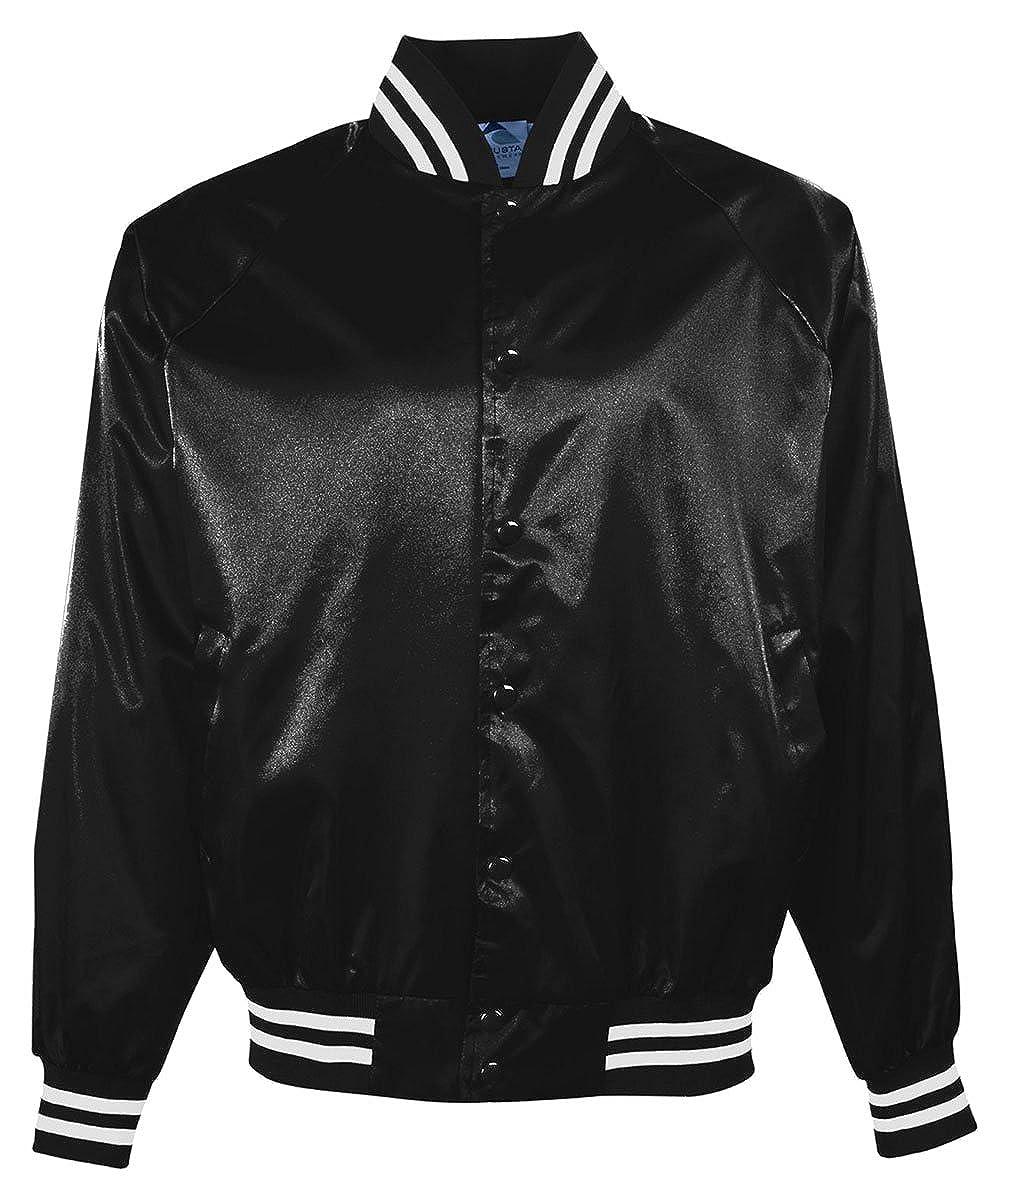 Augusta Sportswear Big Boy's Satin Baseball Jacket 3611